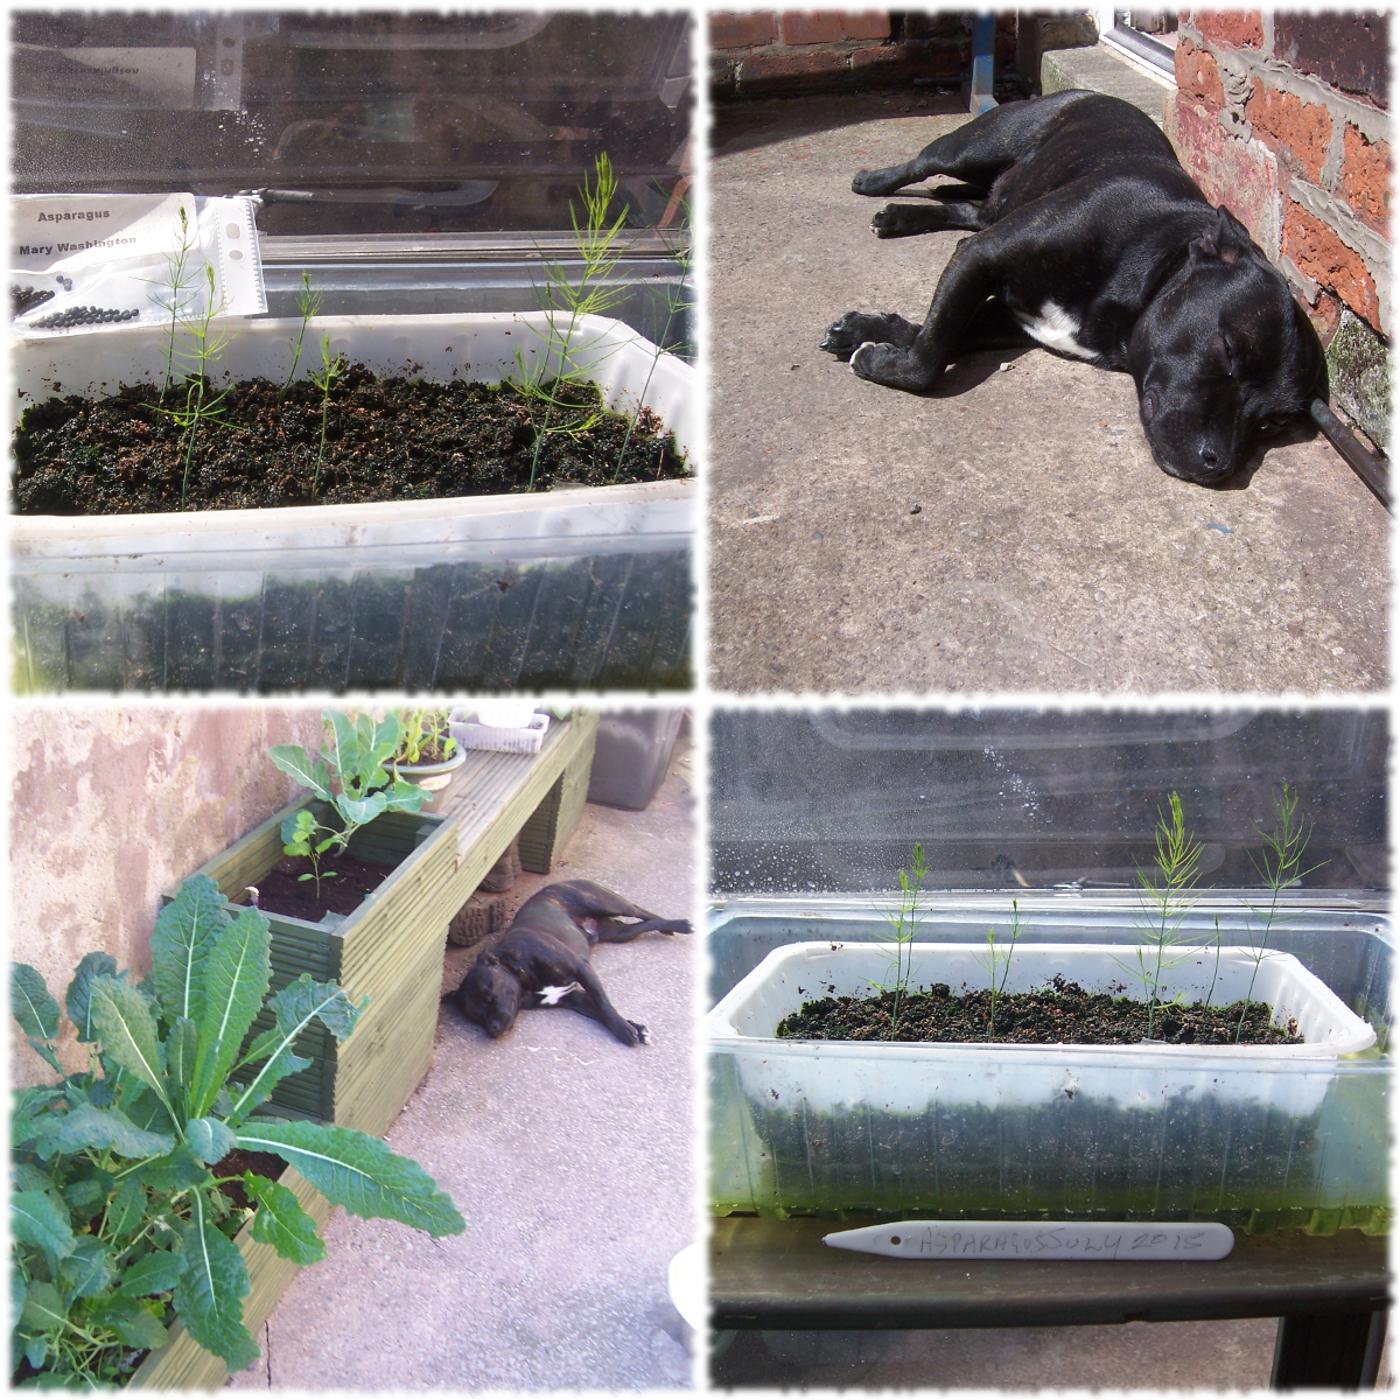 Planting Asparagus Seeds